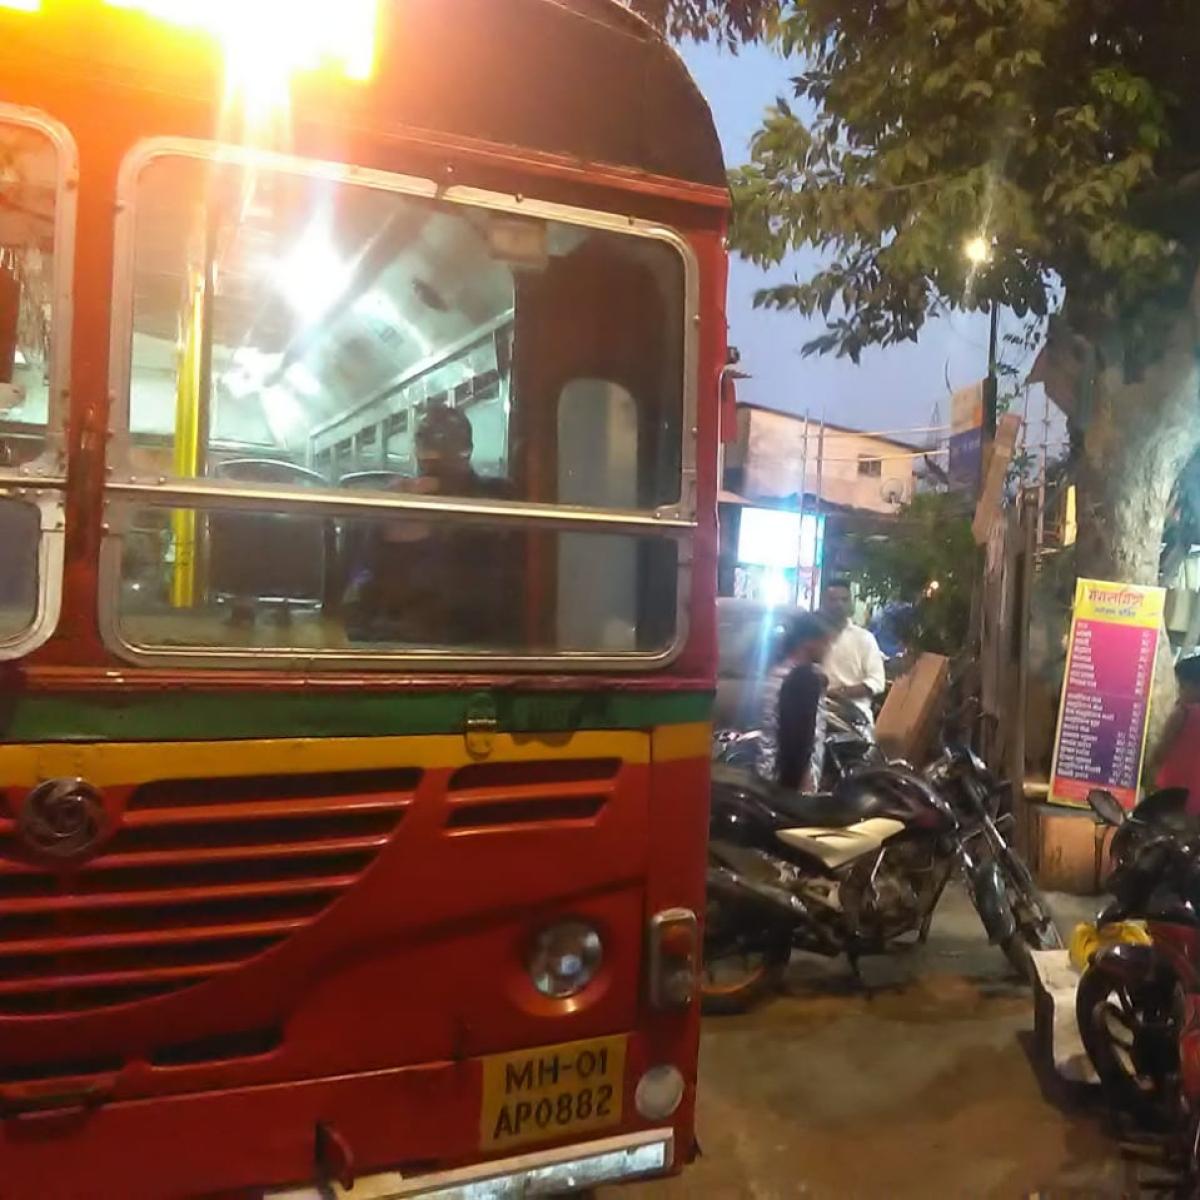 Fed up of auto menace at Bandra (E), public demands BEST services